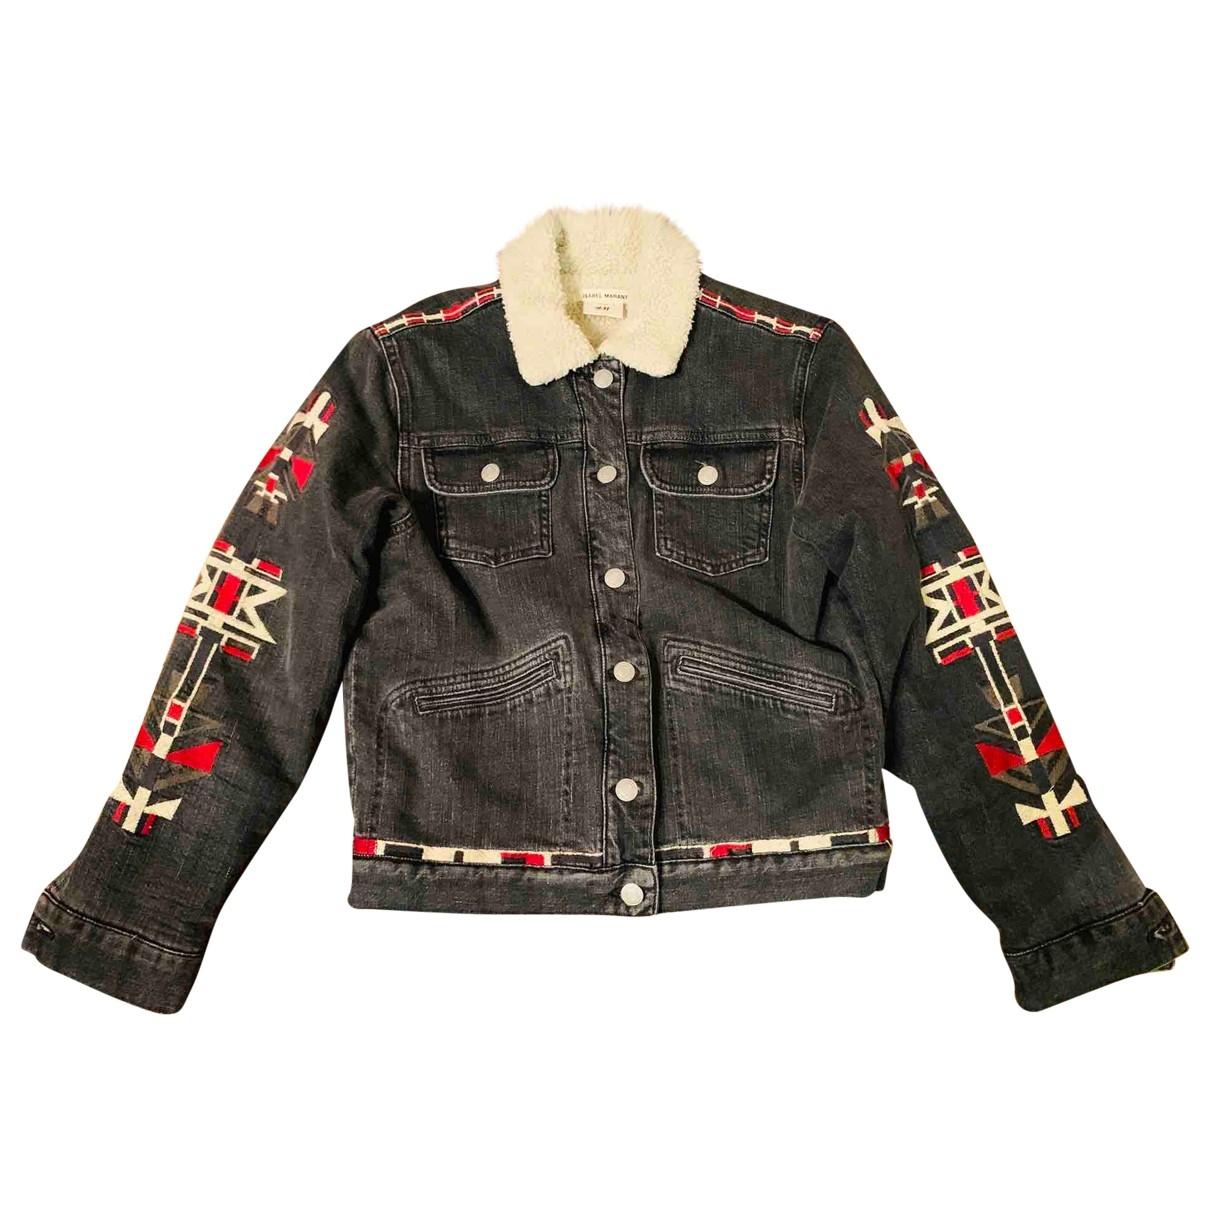 Isabel Marant Pour H&m \N Grey Denim - Jeans jacket for Women S International